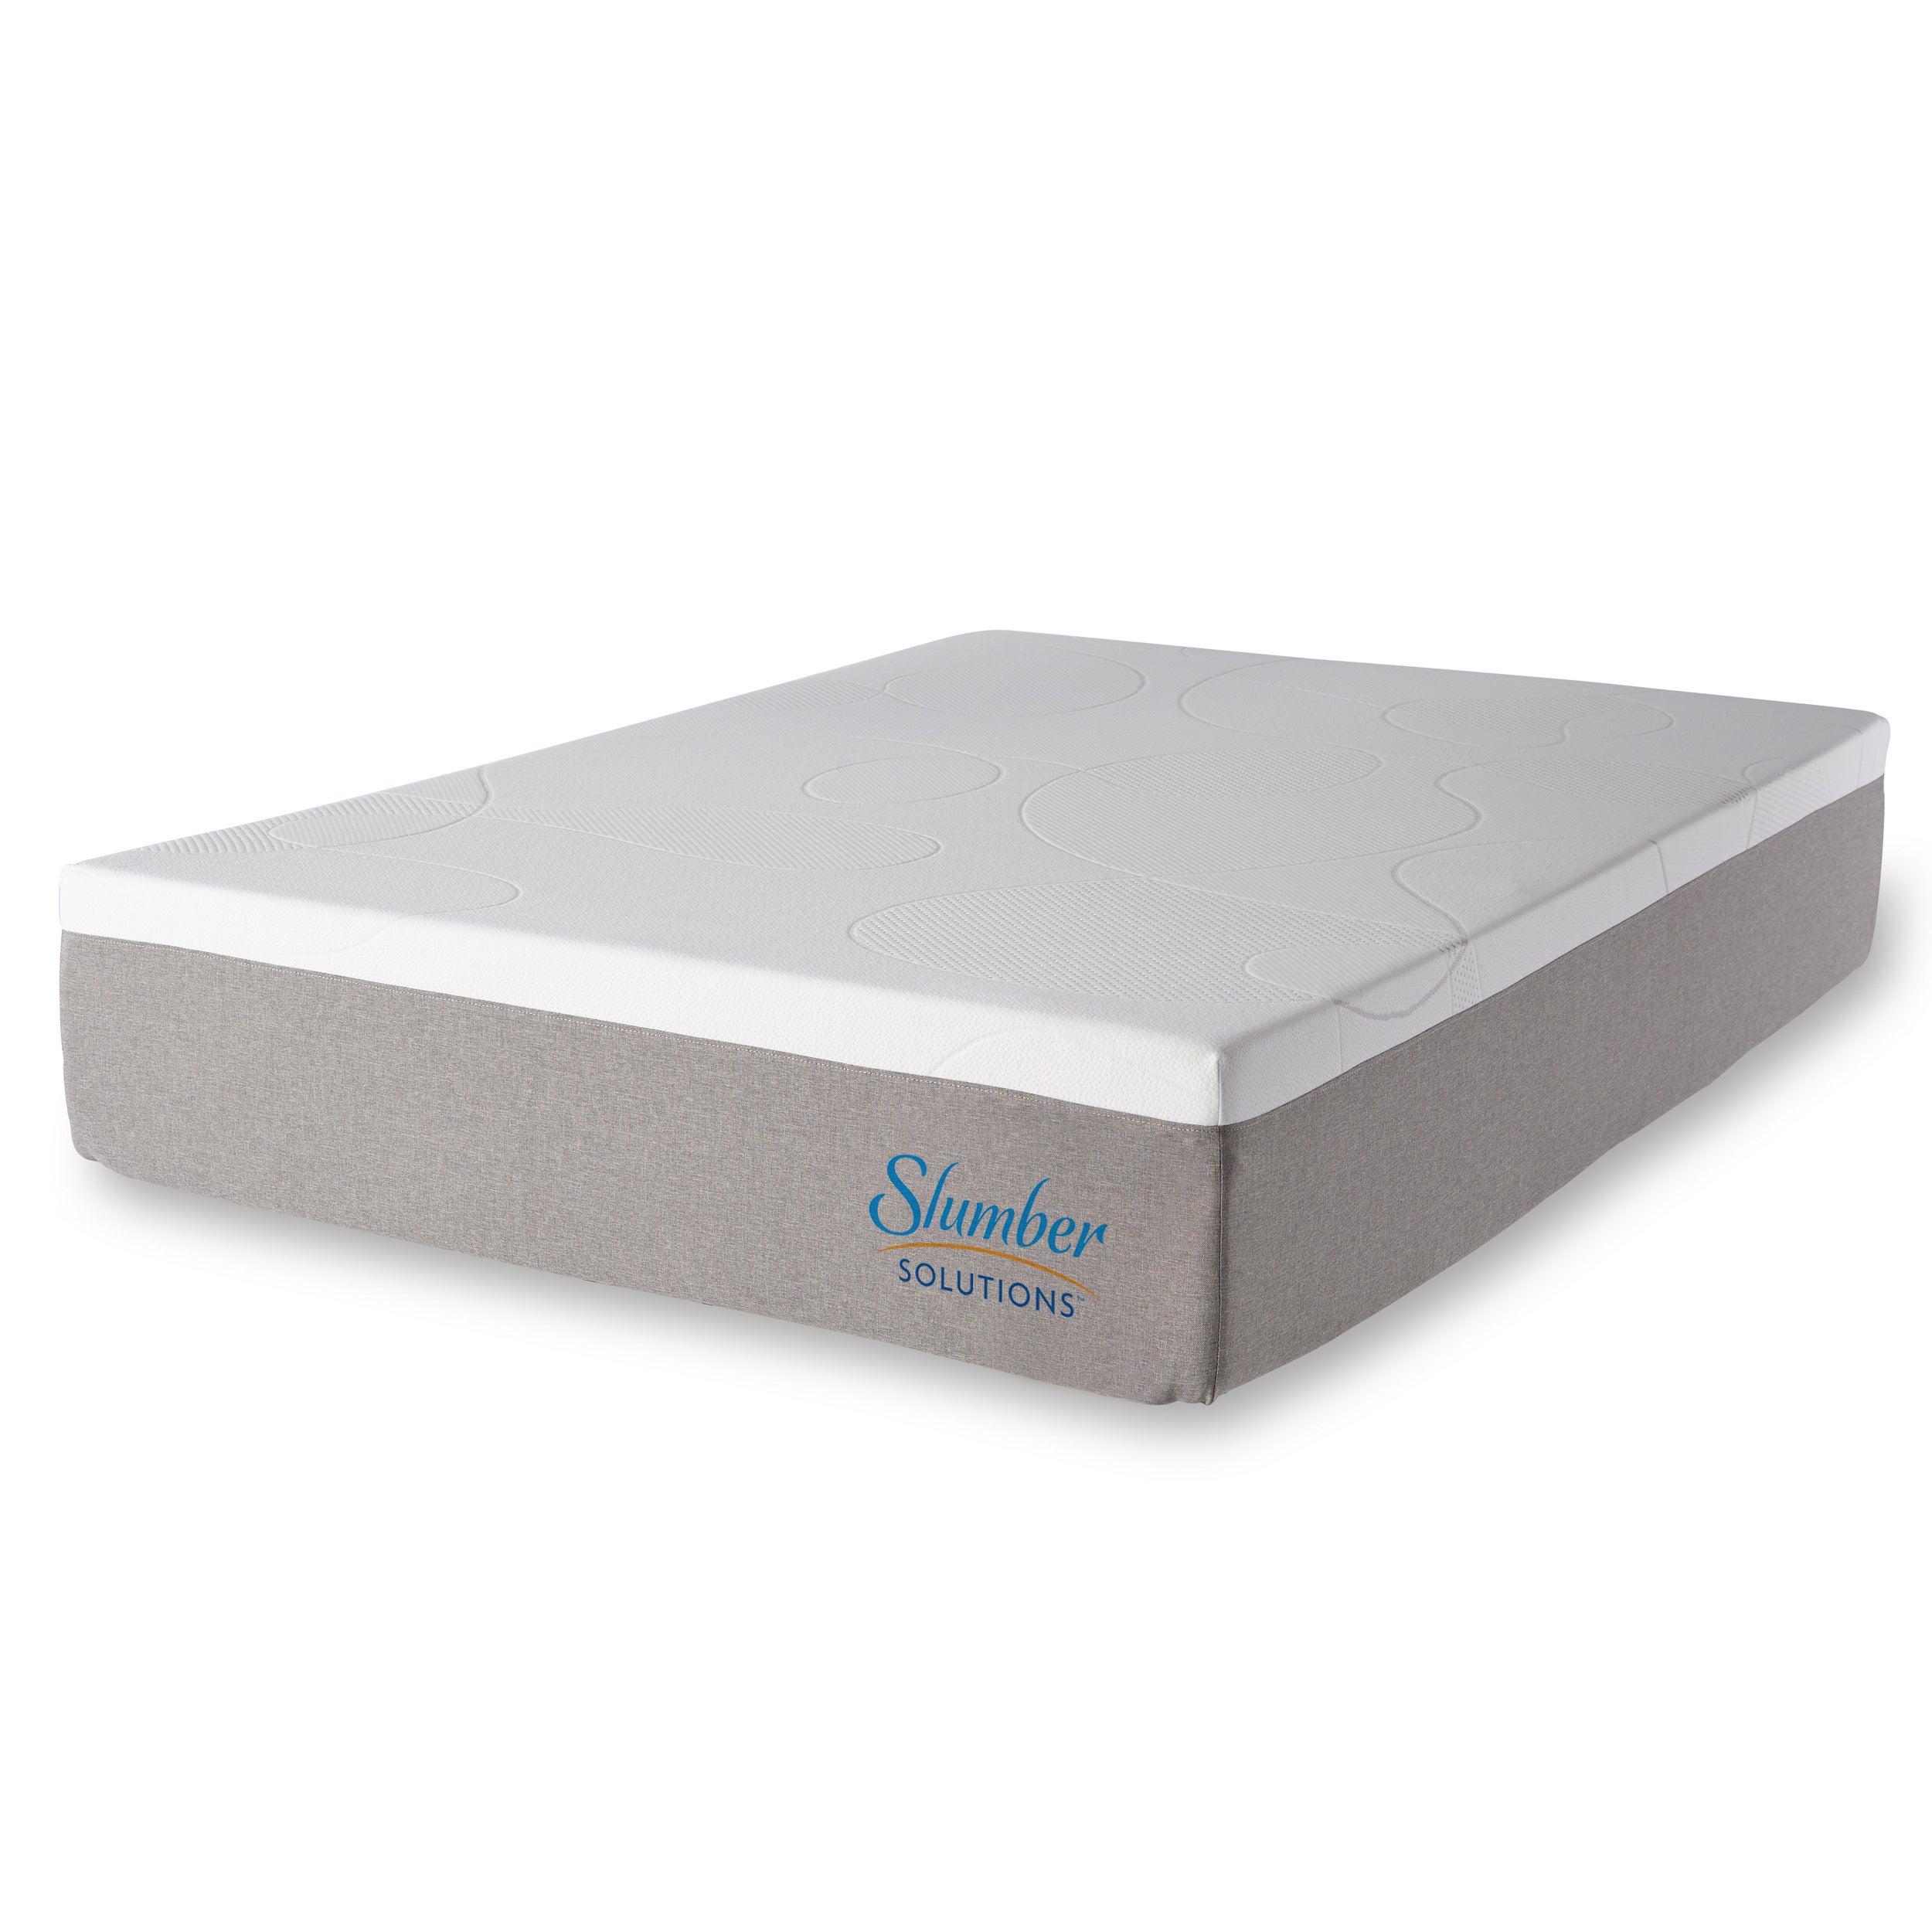 item nassau mattress vitalityqueen queen vitality width memoryfoam trim threshold foam height mlily t furniture products memory